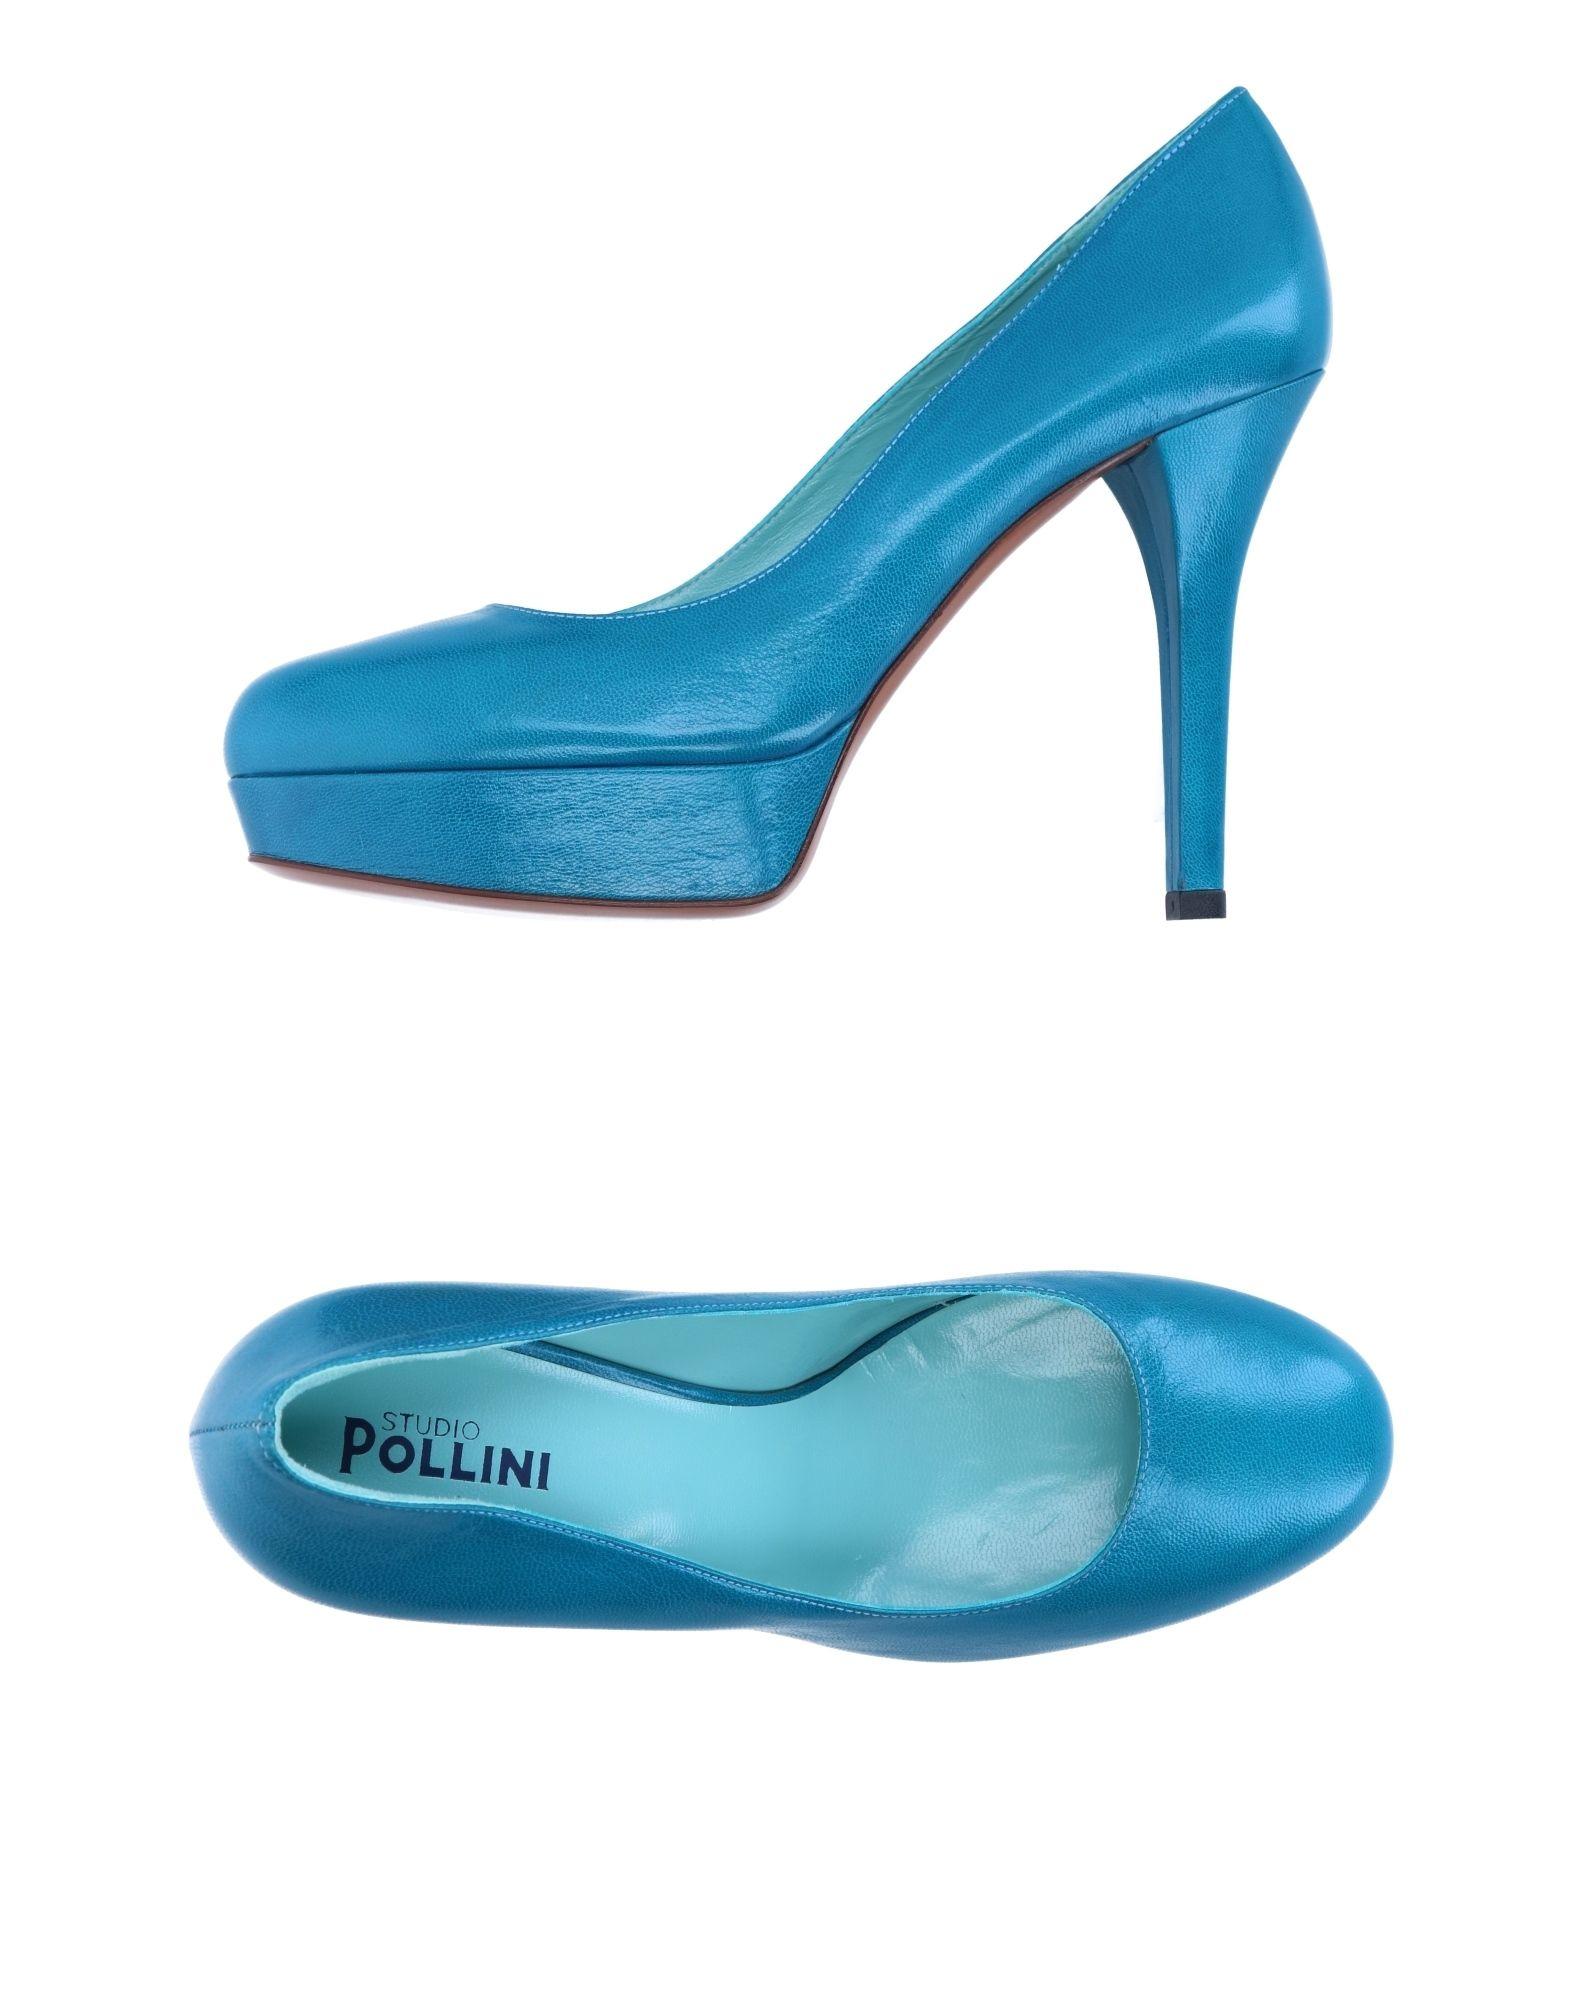 STUDIO POLLINI Туфли цены онлайн